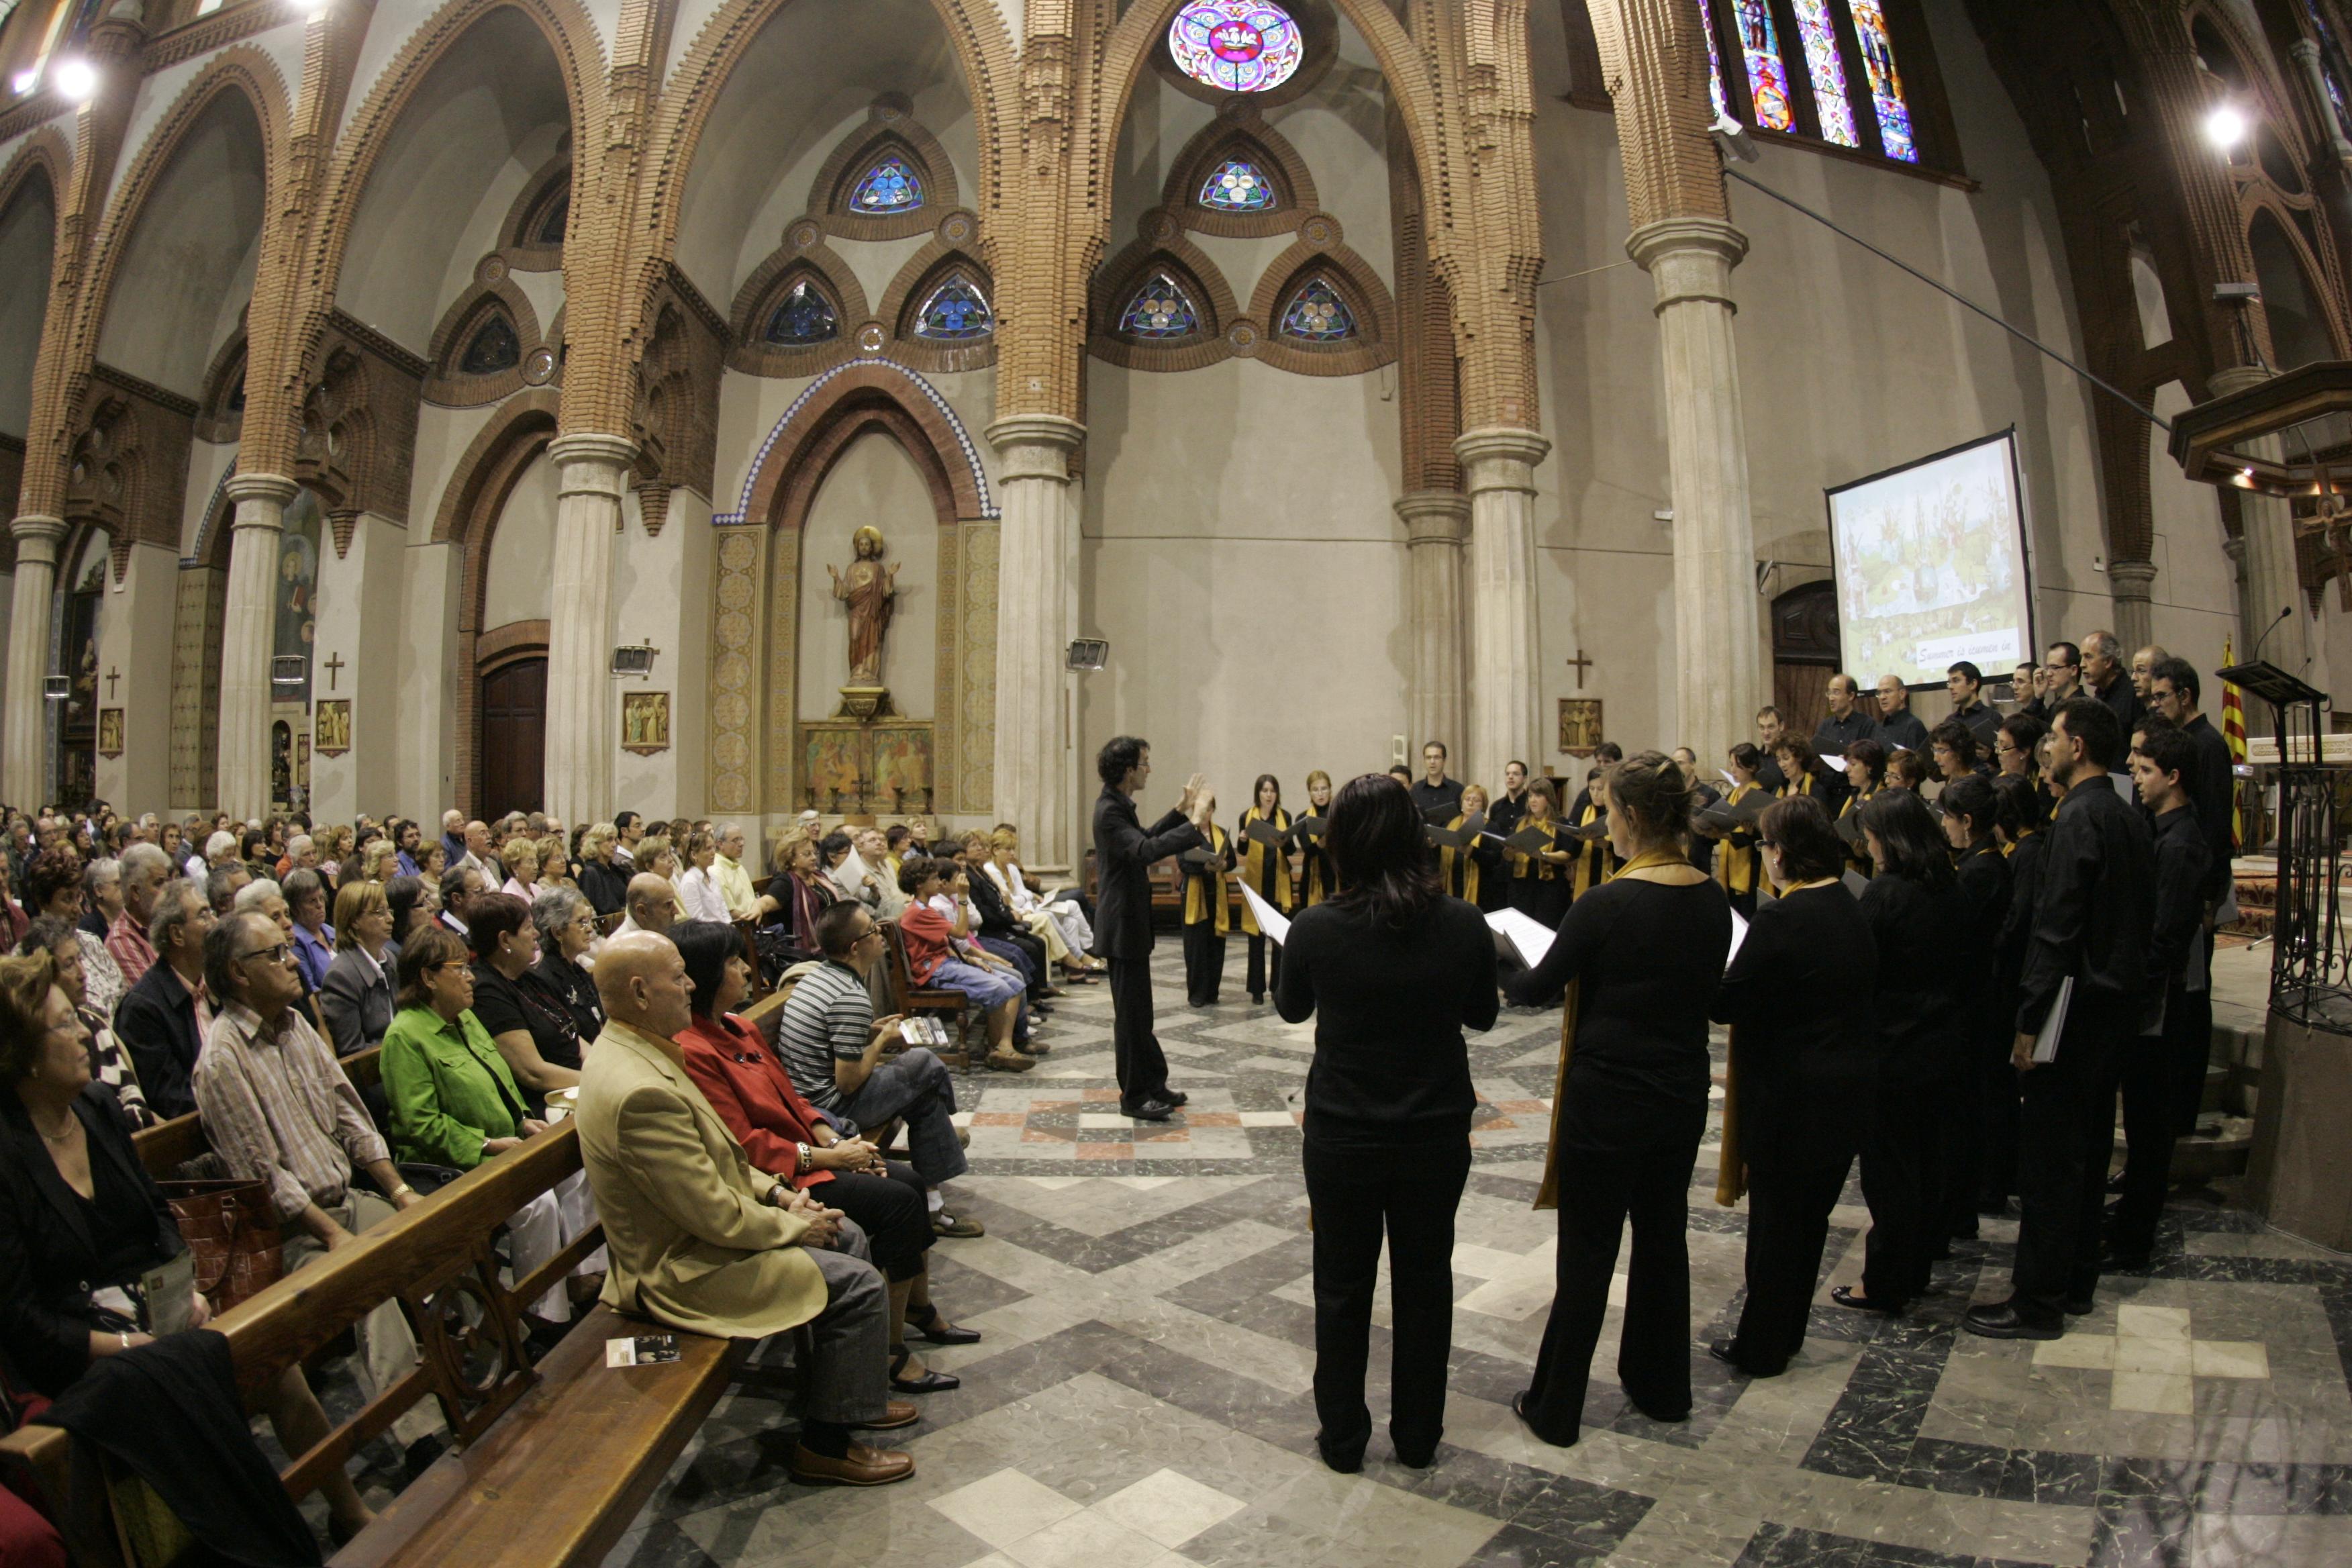 Concert a l'església de Sant Agustí de Sabadell, 28.9.08